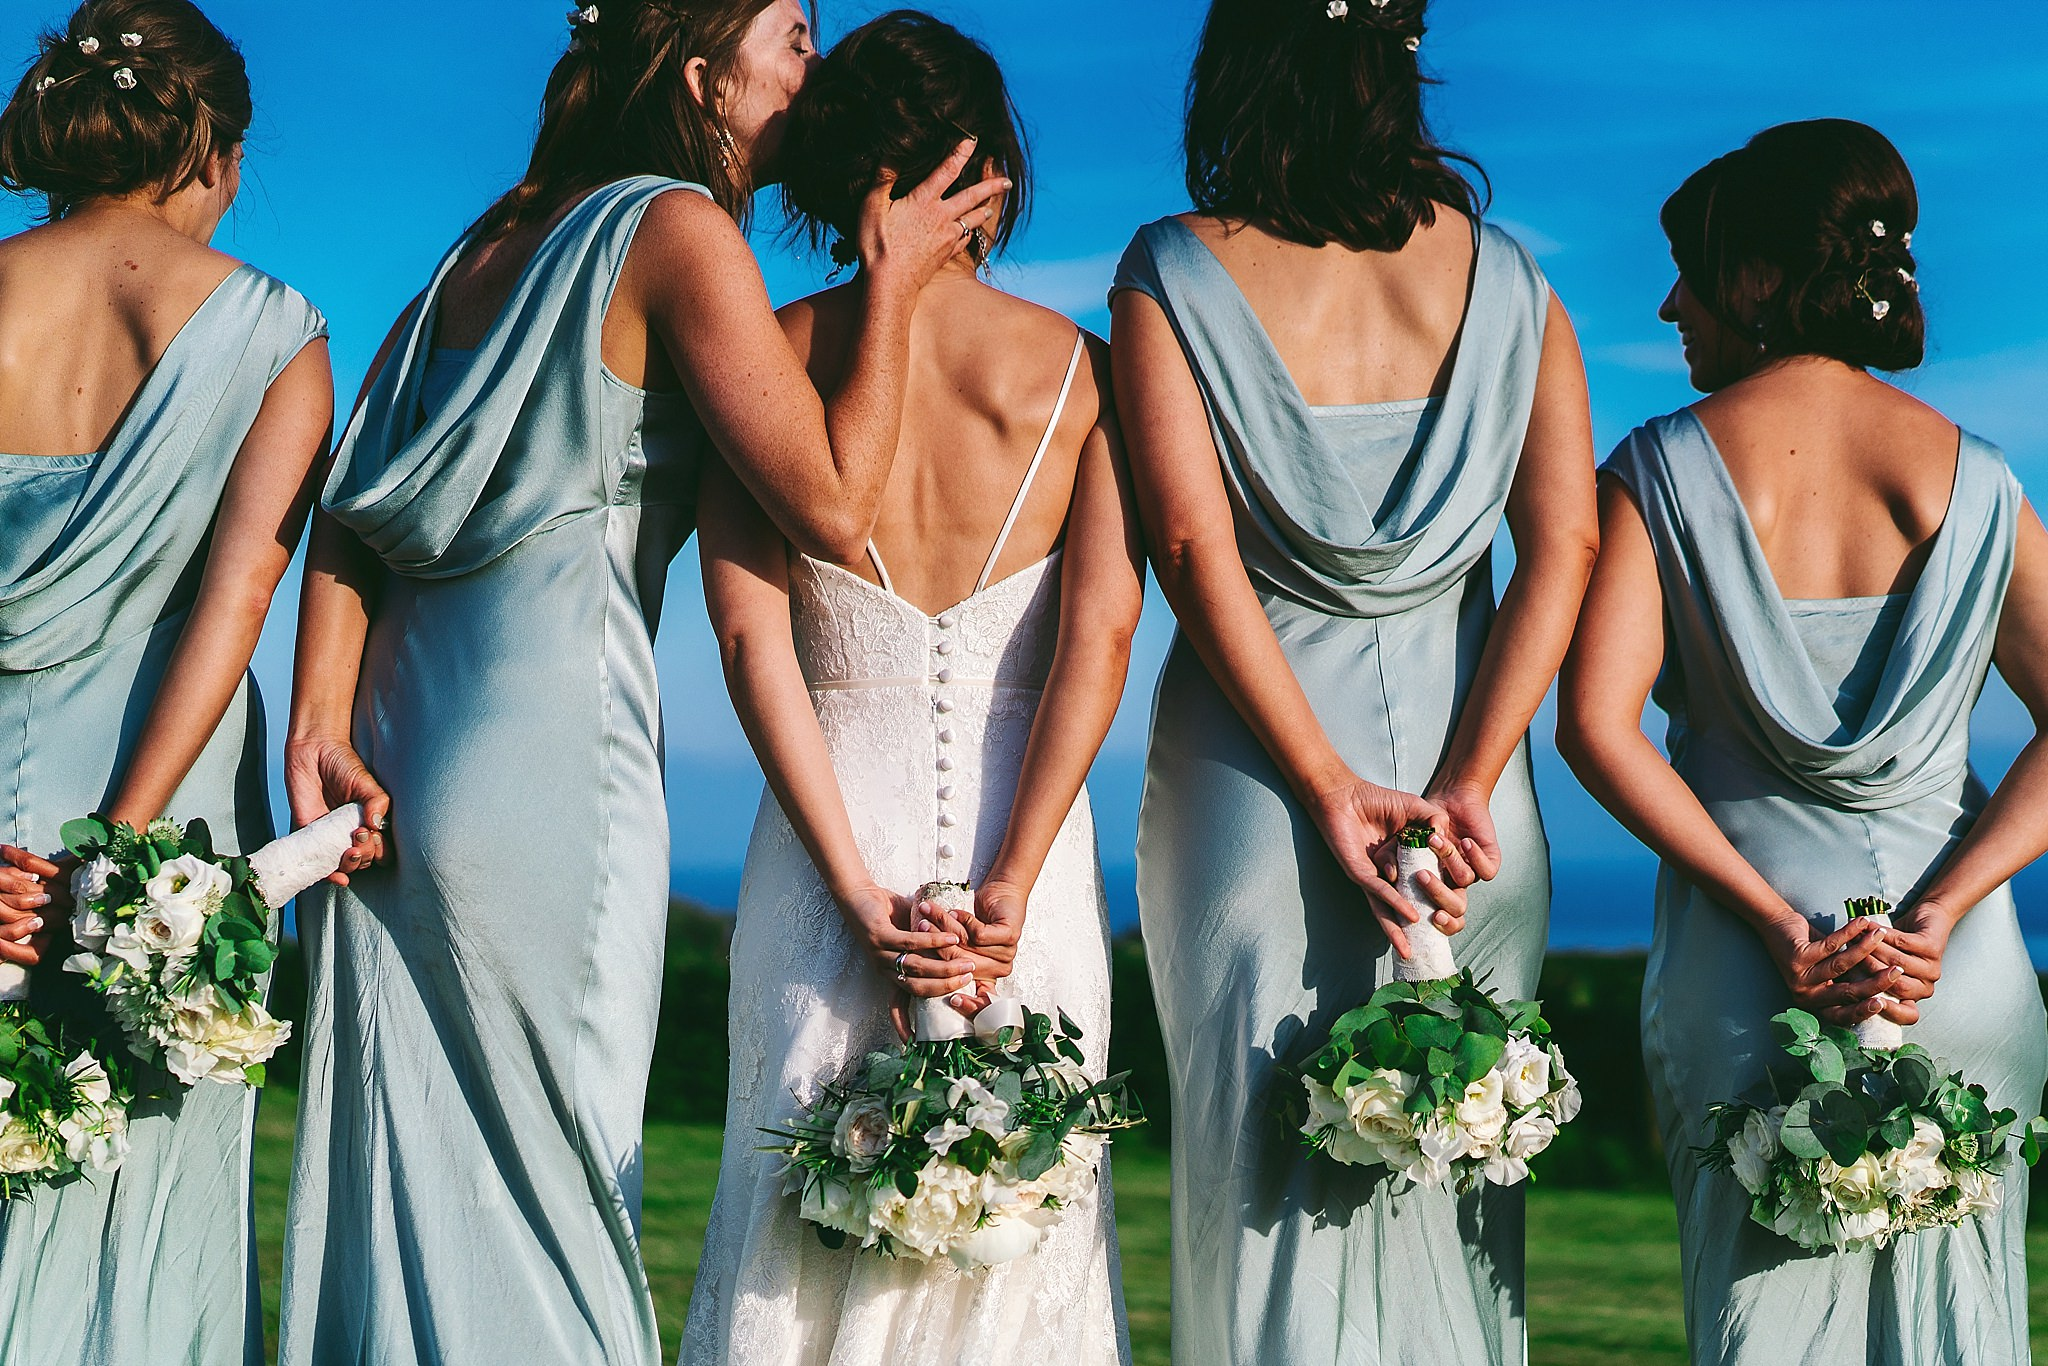 aga-tomaszek-wedding-photographer-cardiff-2016_1116